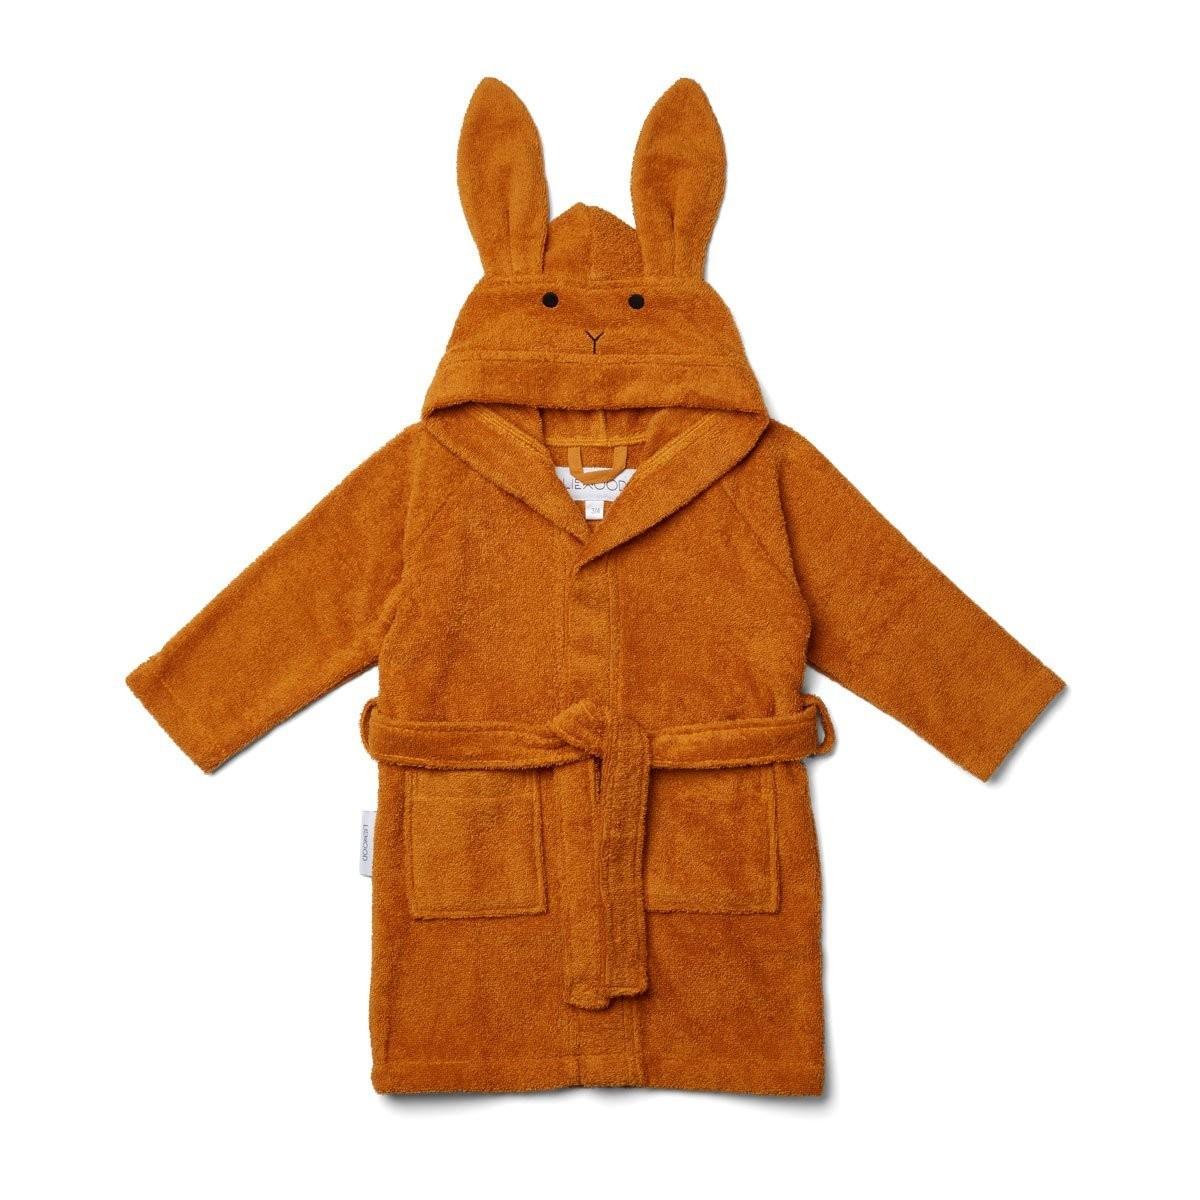 Bathrobe-Bathrobe-LW12387-0130_Rabbit_mustard